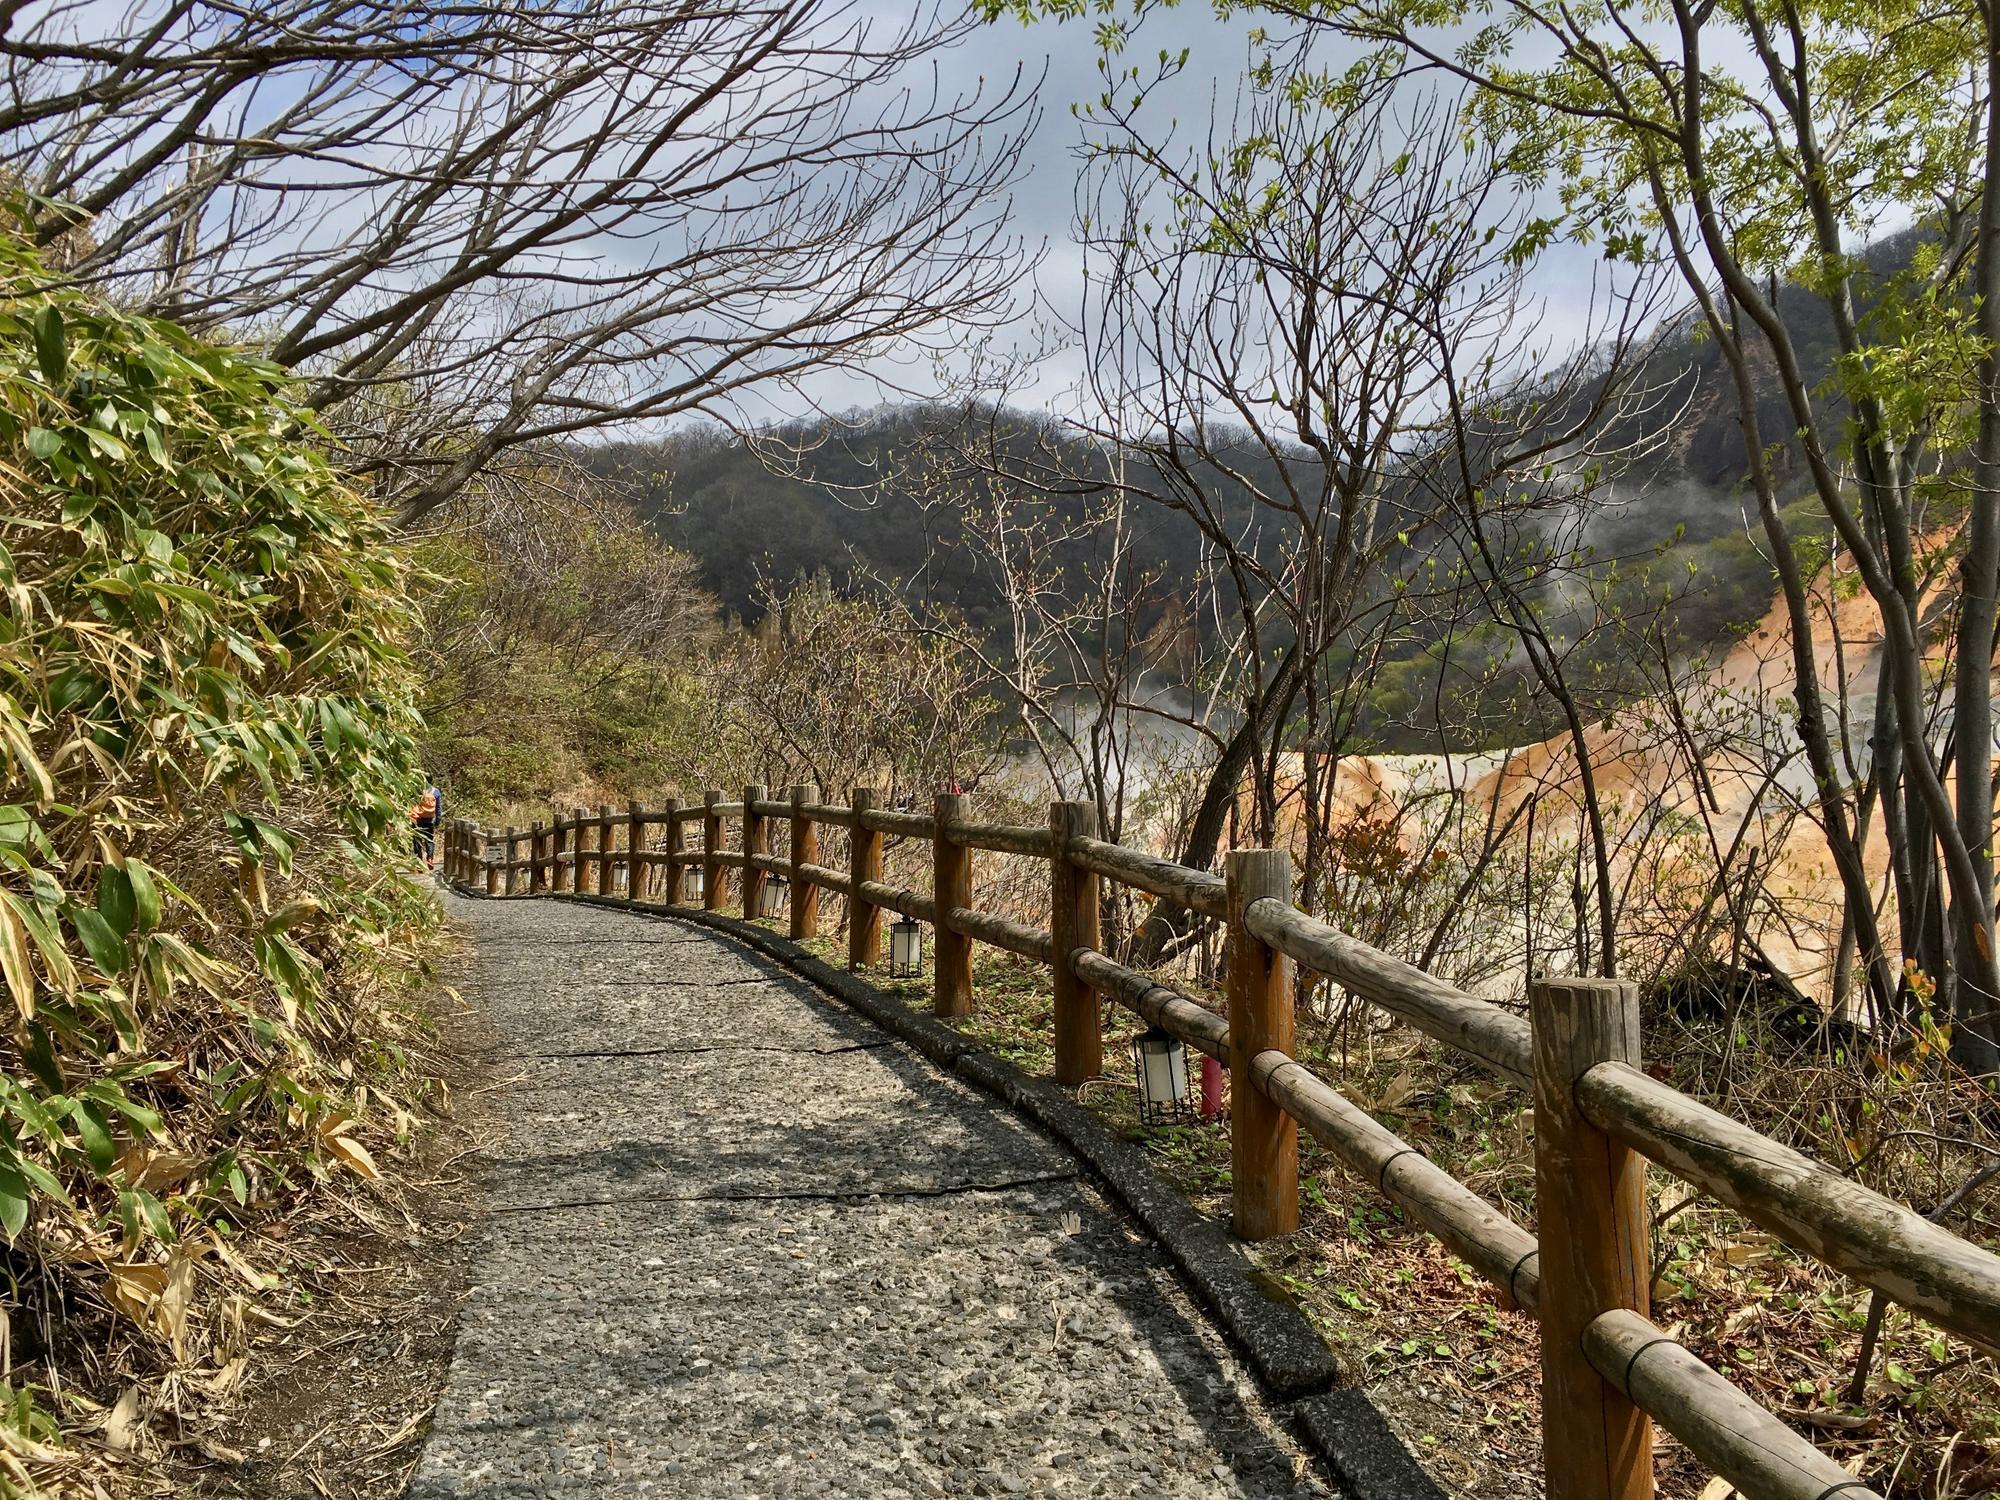 🇯🇵 Noboribetsu, Japan, May 2018.